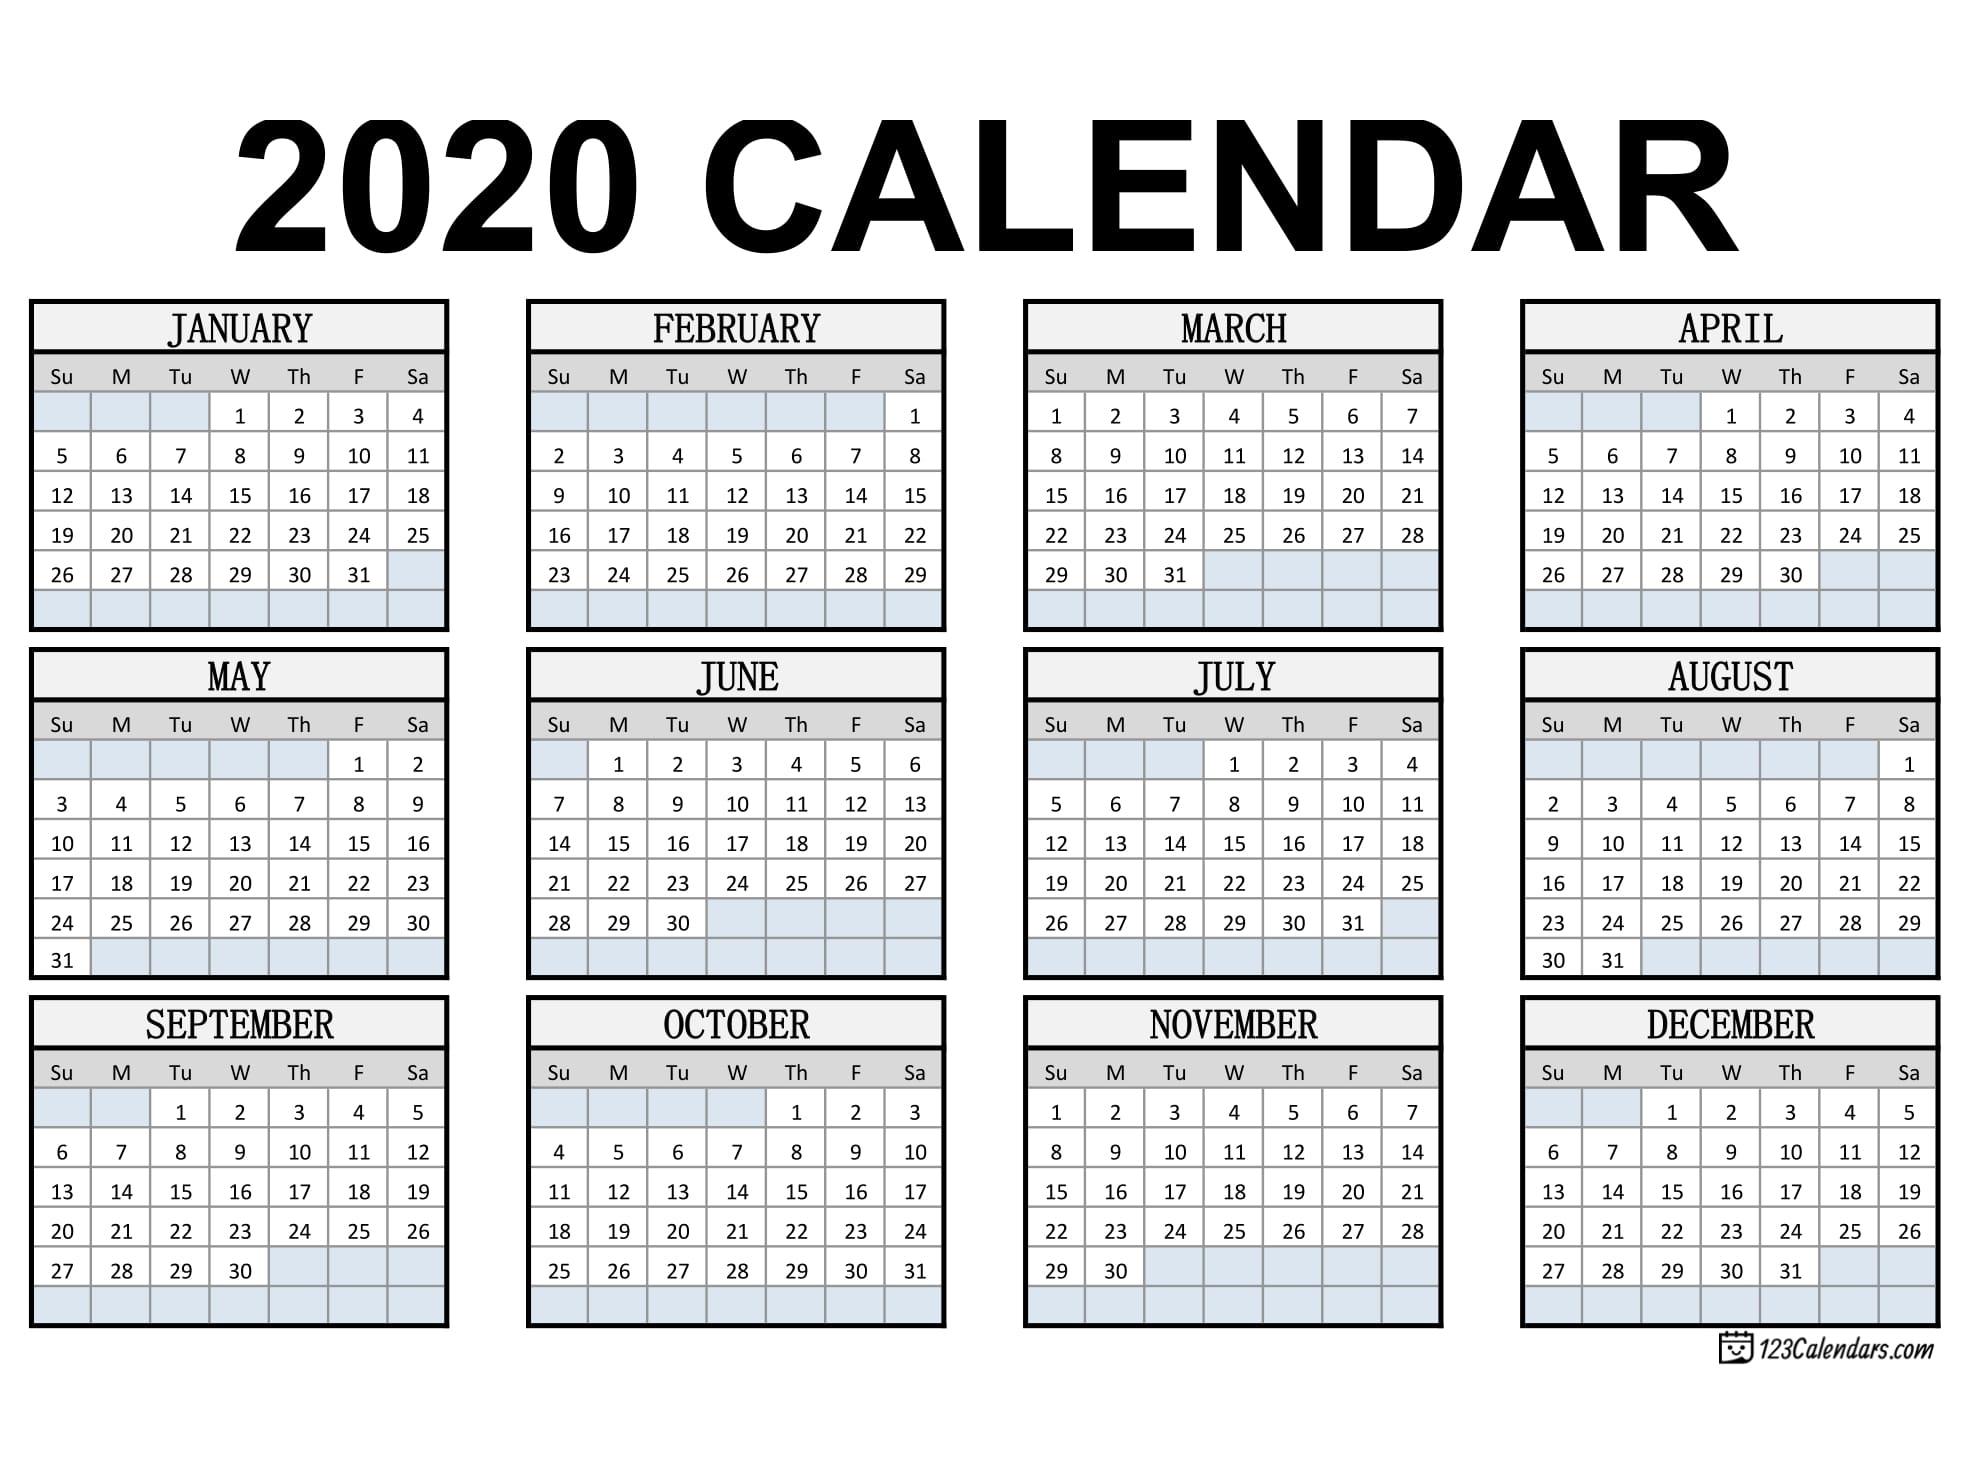 Free Printable Year 2020 Calendar | 123Calendars